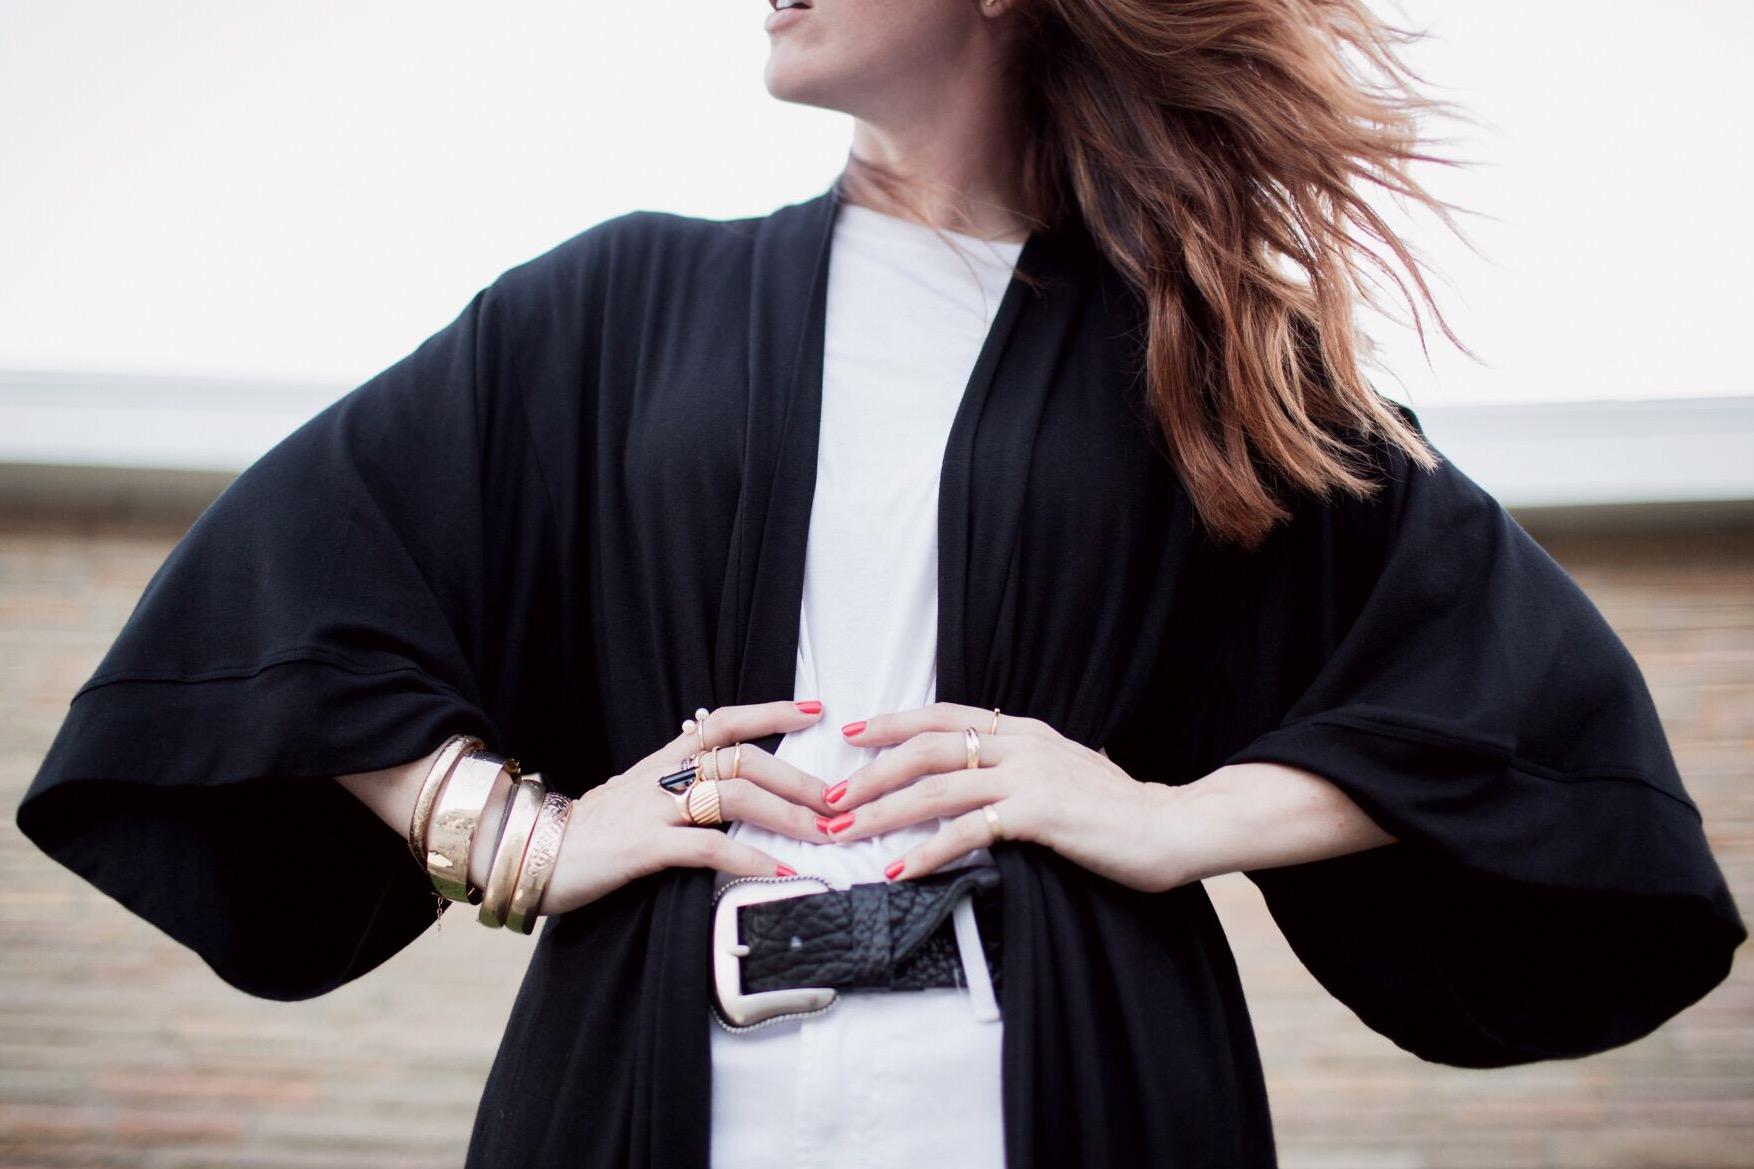 eldridge_edit_anna_e_cottrell_fashion_blogger_black_and_white_shop_lola_boutique_mgb_photo_mother_white_jean_b_low_the_belt_dita_freebird_sunglasses_joie_cognac_mules_vintage_bracelets_2.jpg